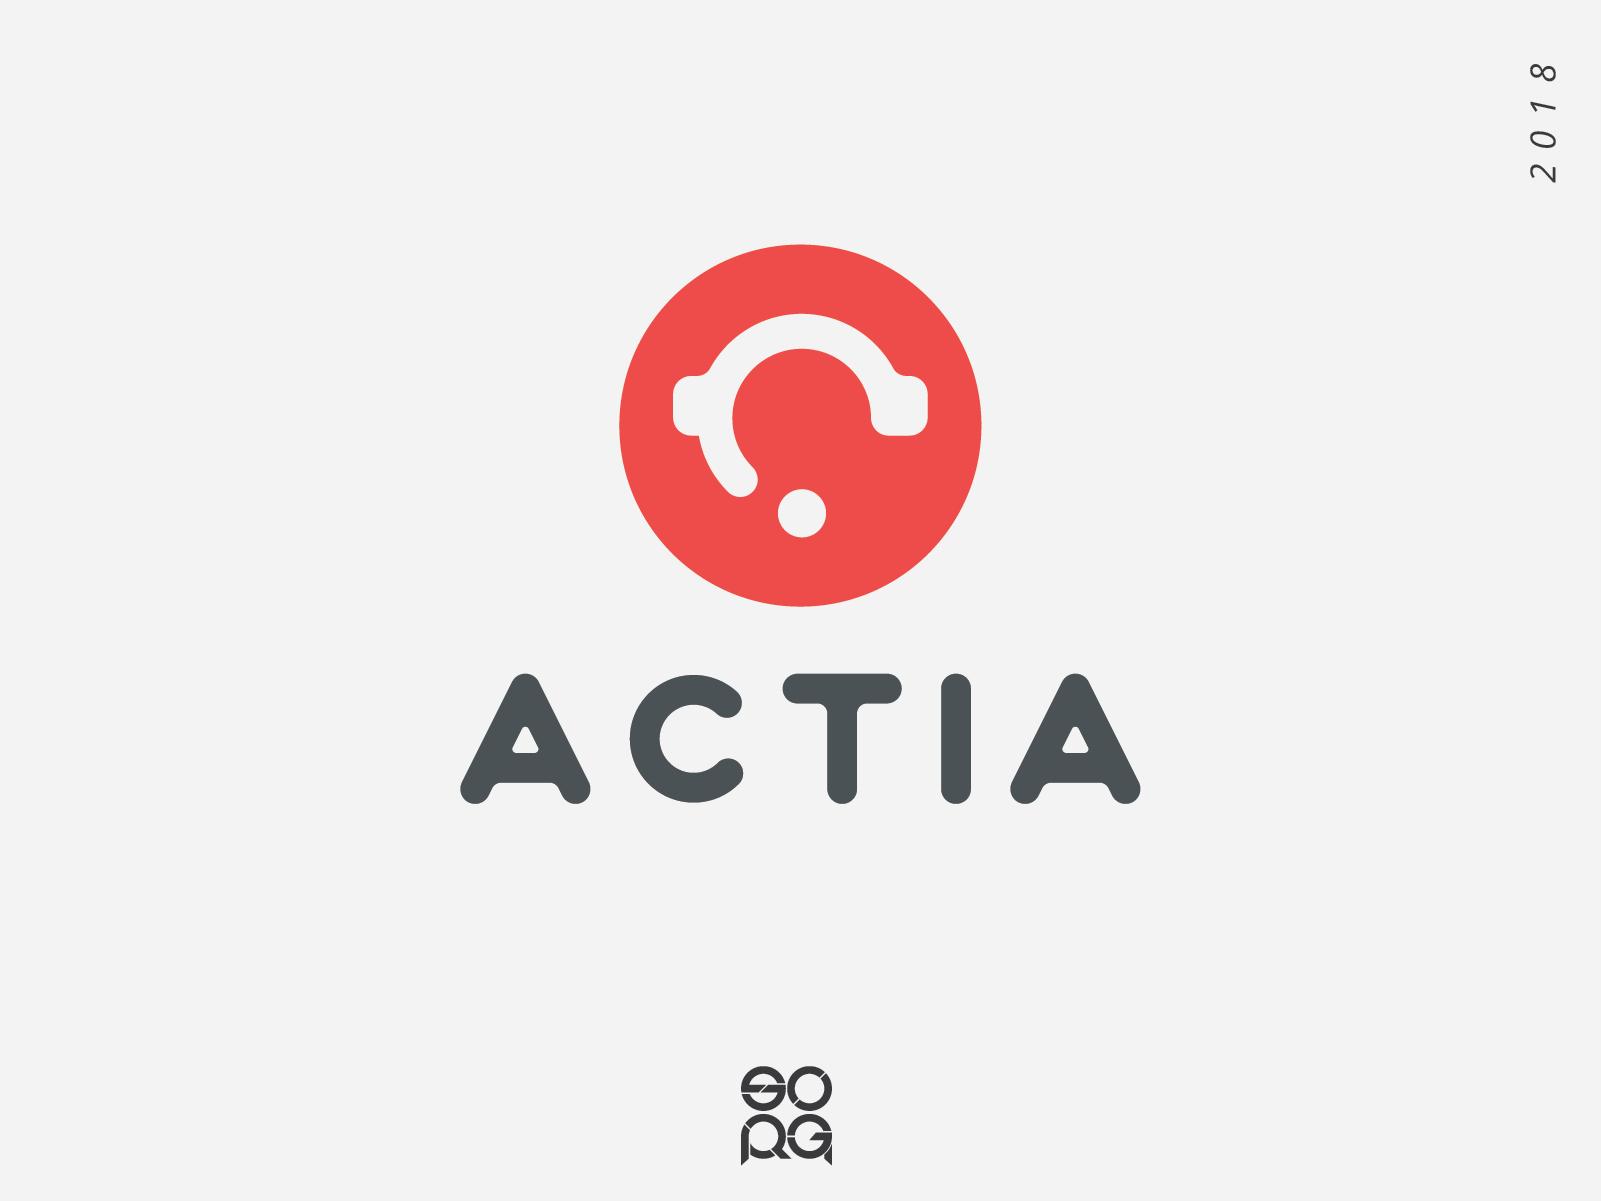 actia call center talk with us call logo call center call center design actia call center talk with us